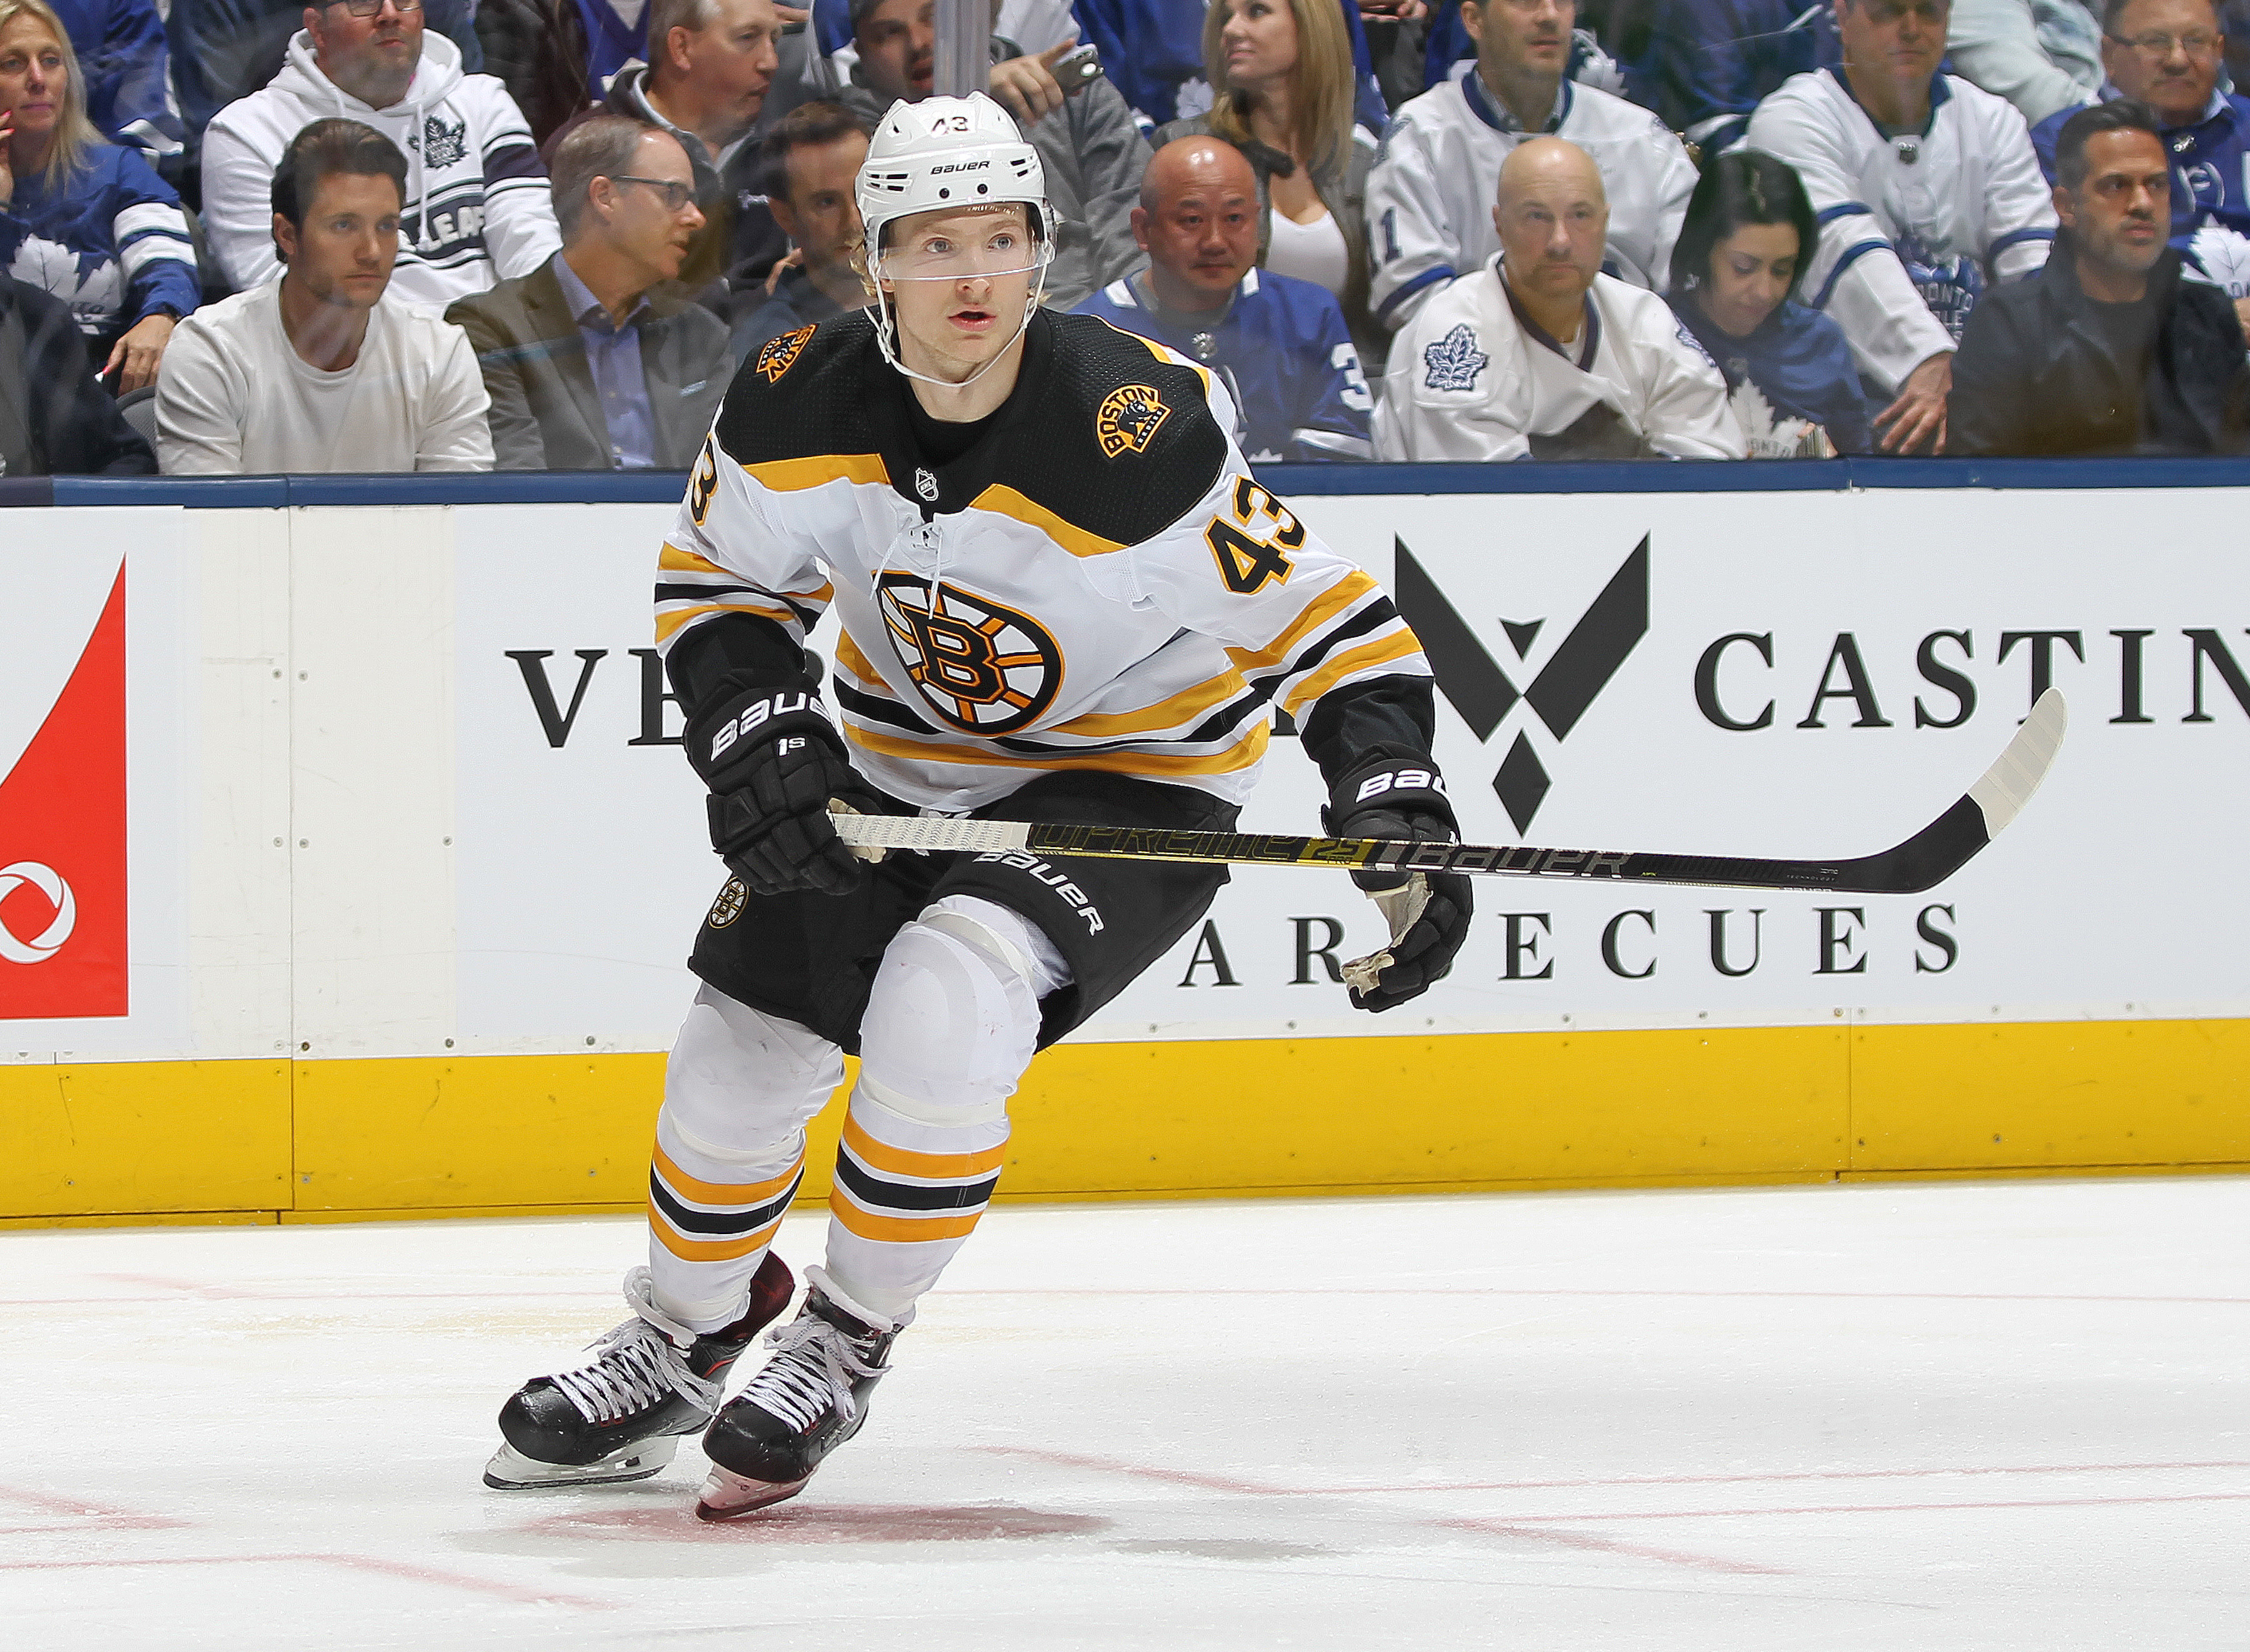 Danton Heinen, Jake DeBrusk among Bruins' bright spots in loss to